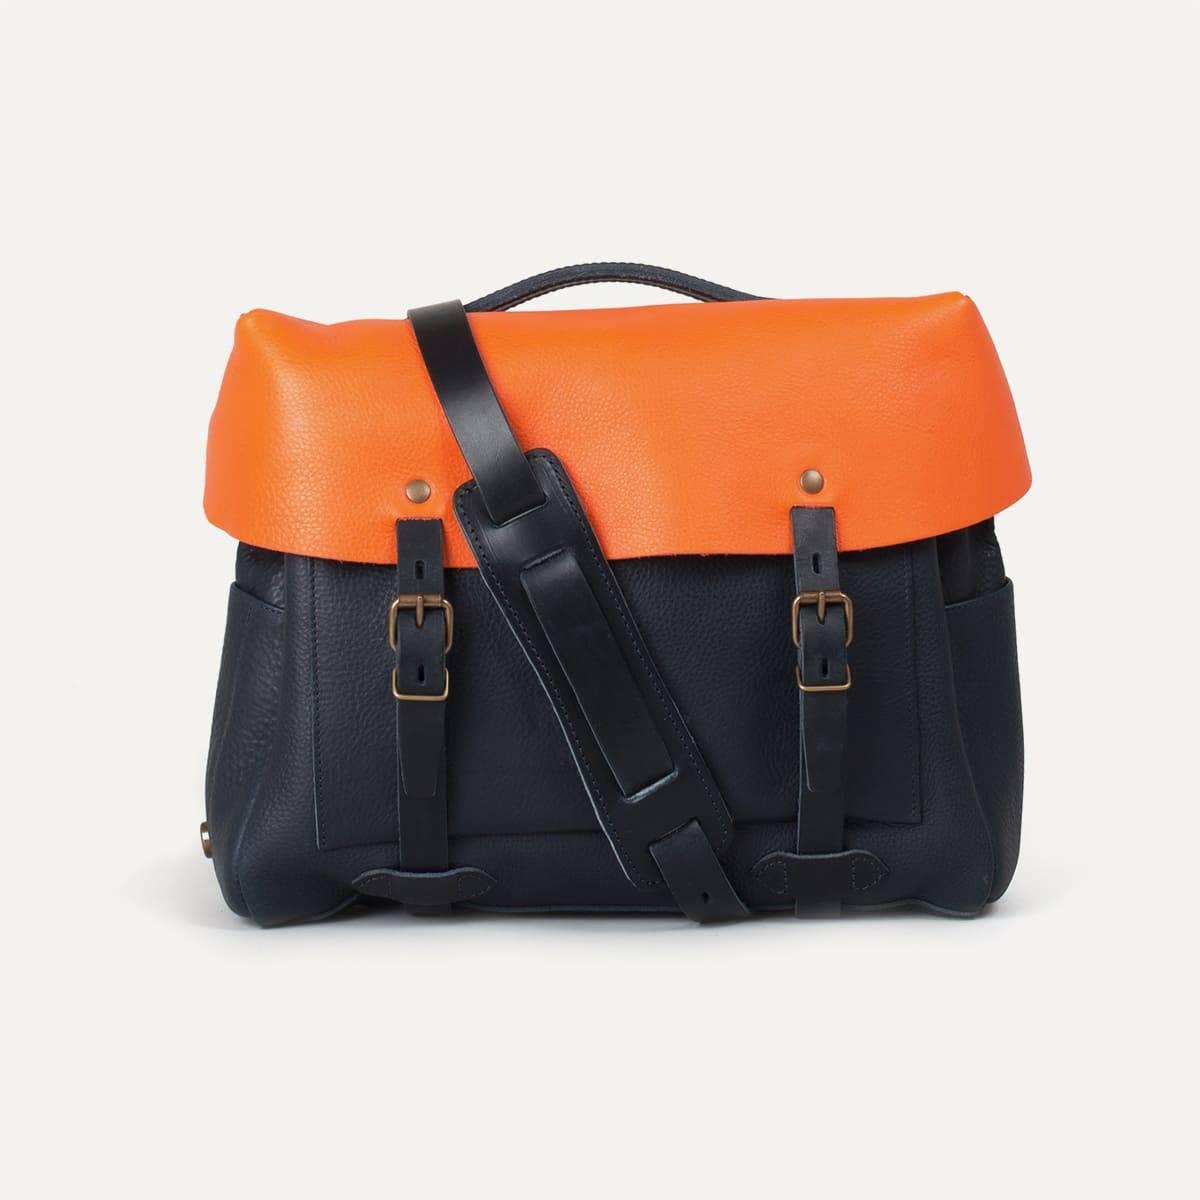 Sac Eclair Bleu de Chauffe x Blitz - Navy/Orange (image n°1)